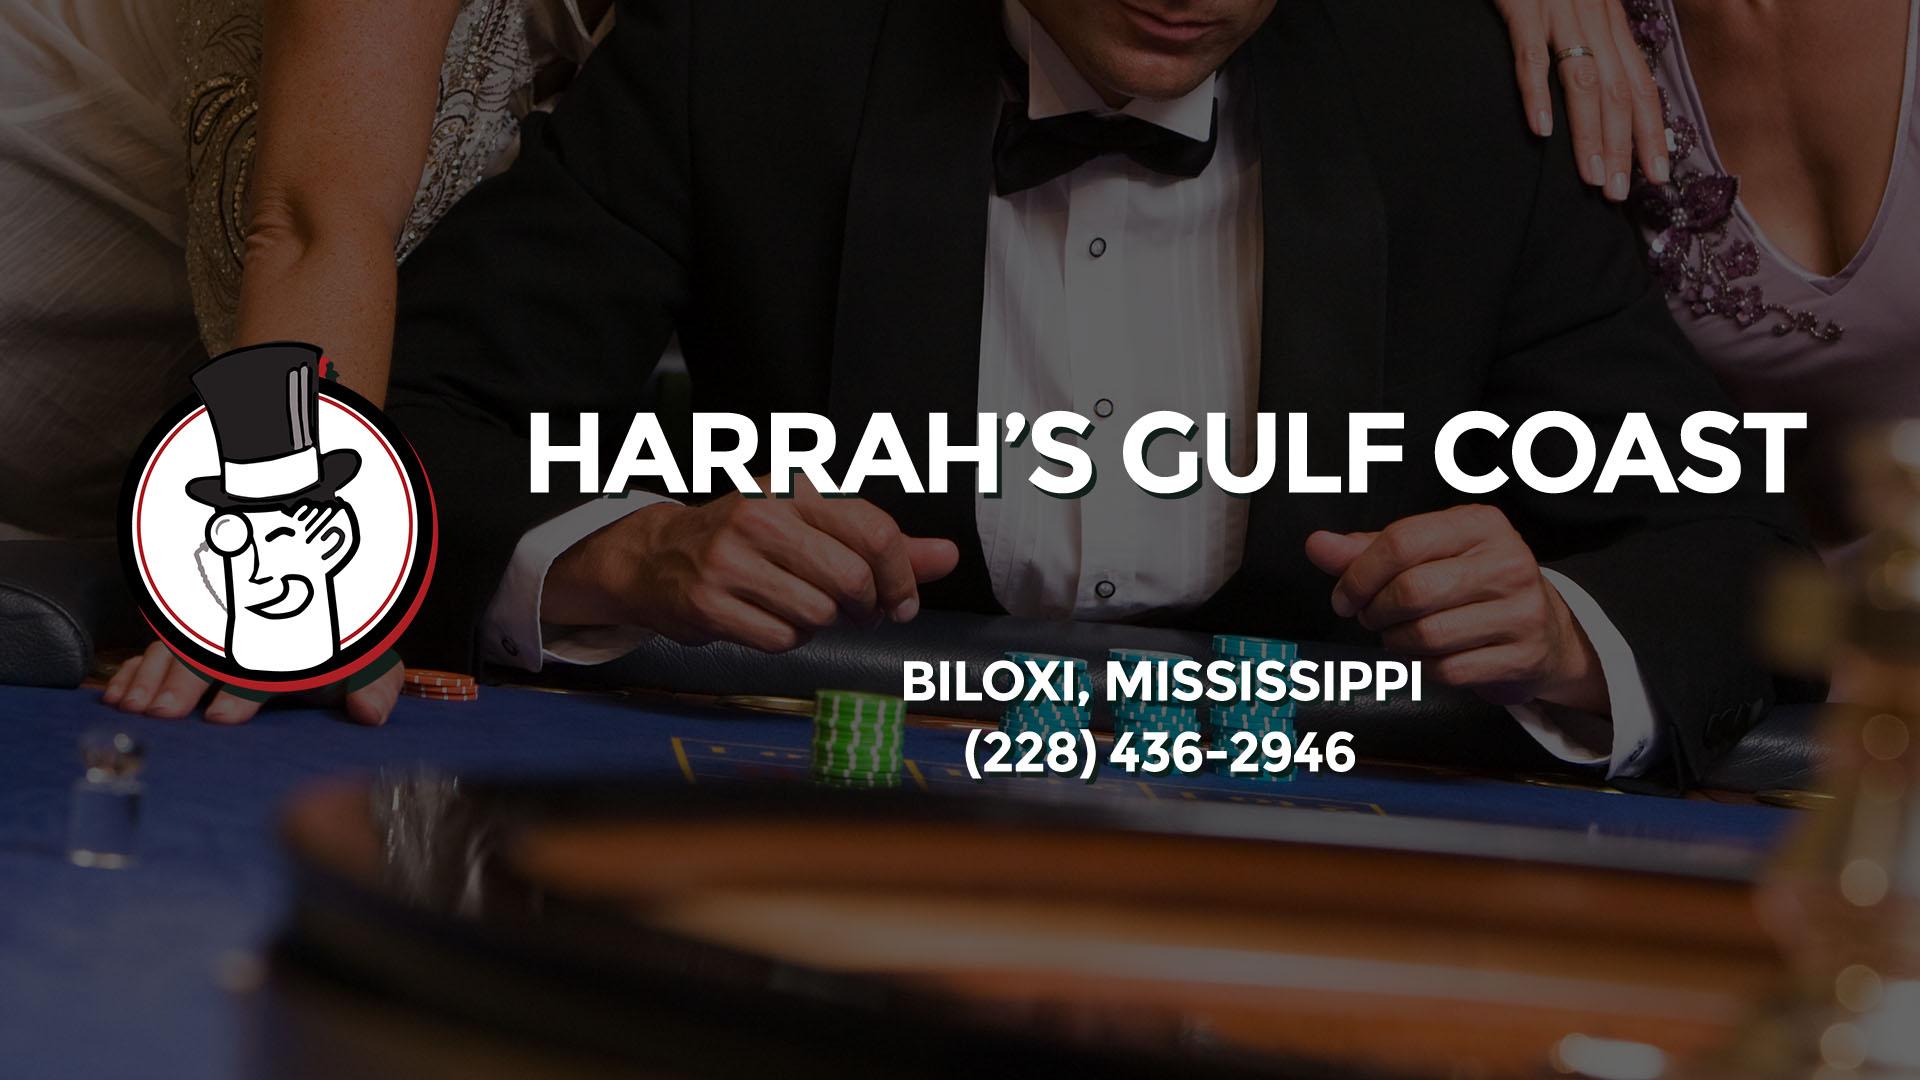 Barons Bus Casino Headers 424 Harrahs Gulf Coast Biloxi Ms Jpg